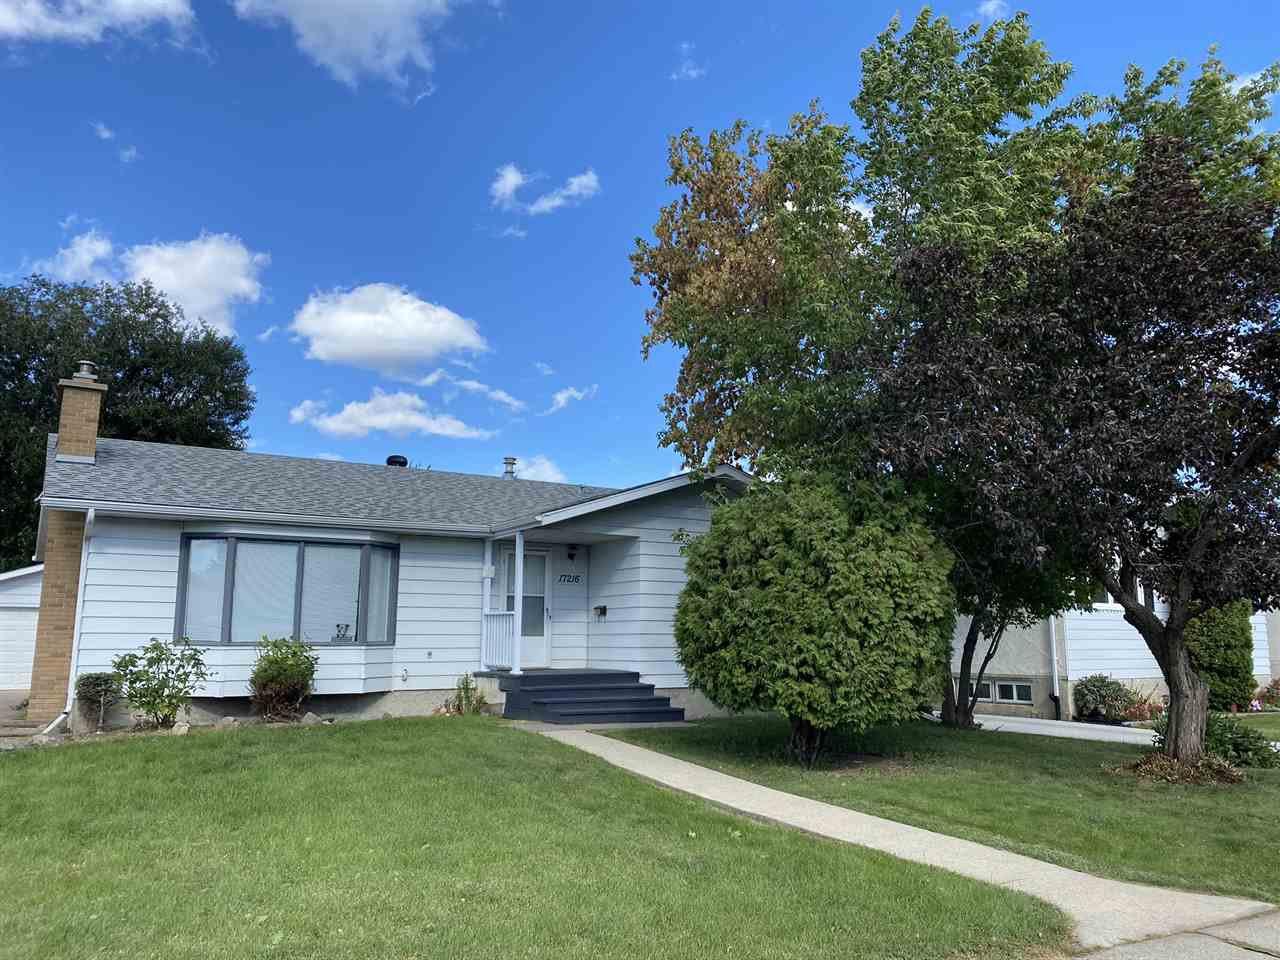 Main Photo: 17216 77 Avenue in Edmonton: Zone 20 House for sale : MLS®# E4198698